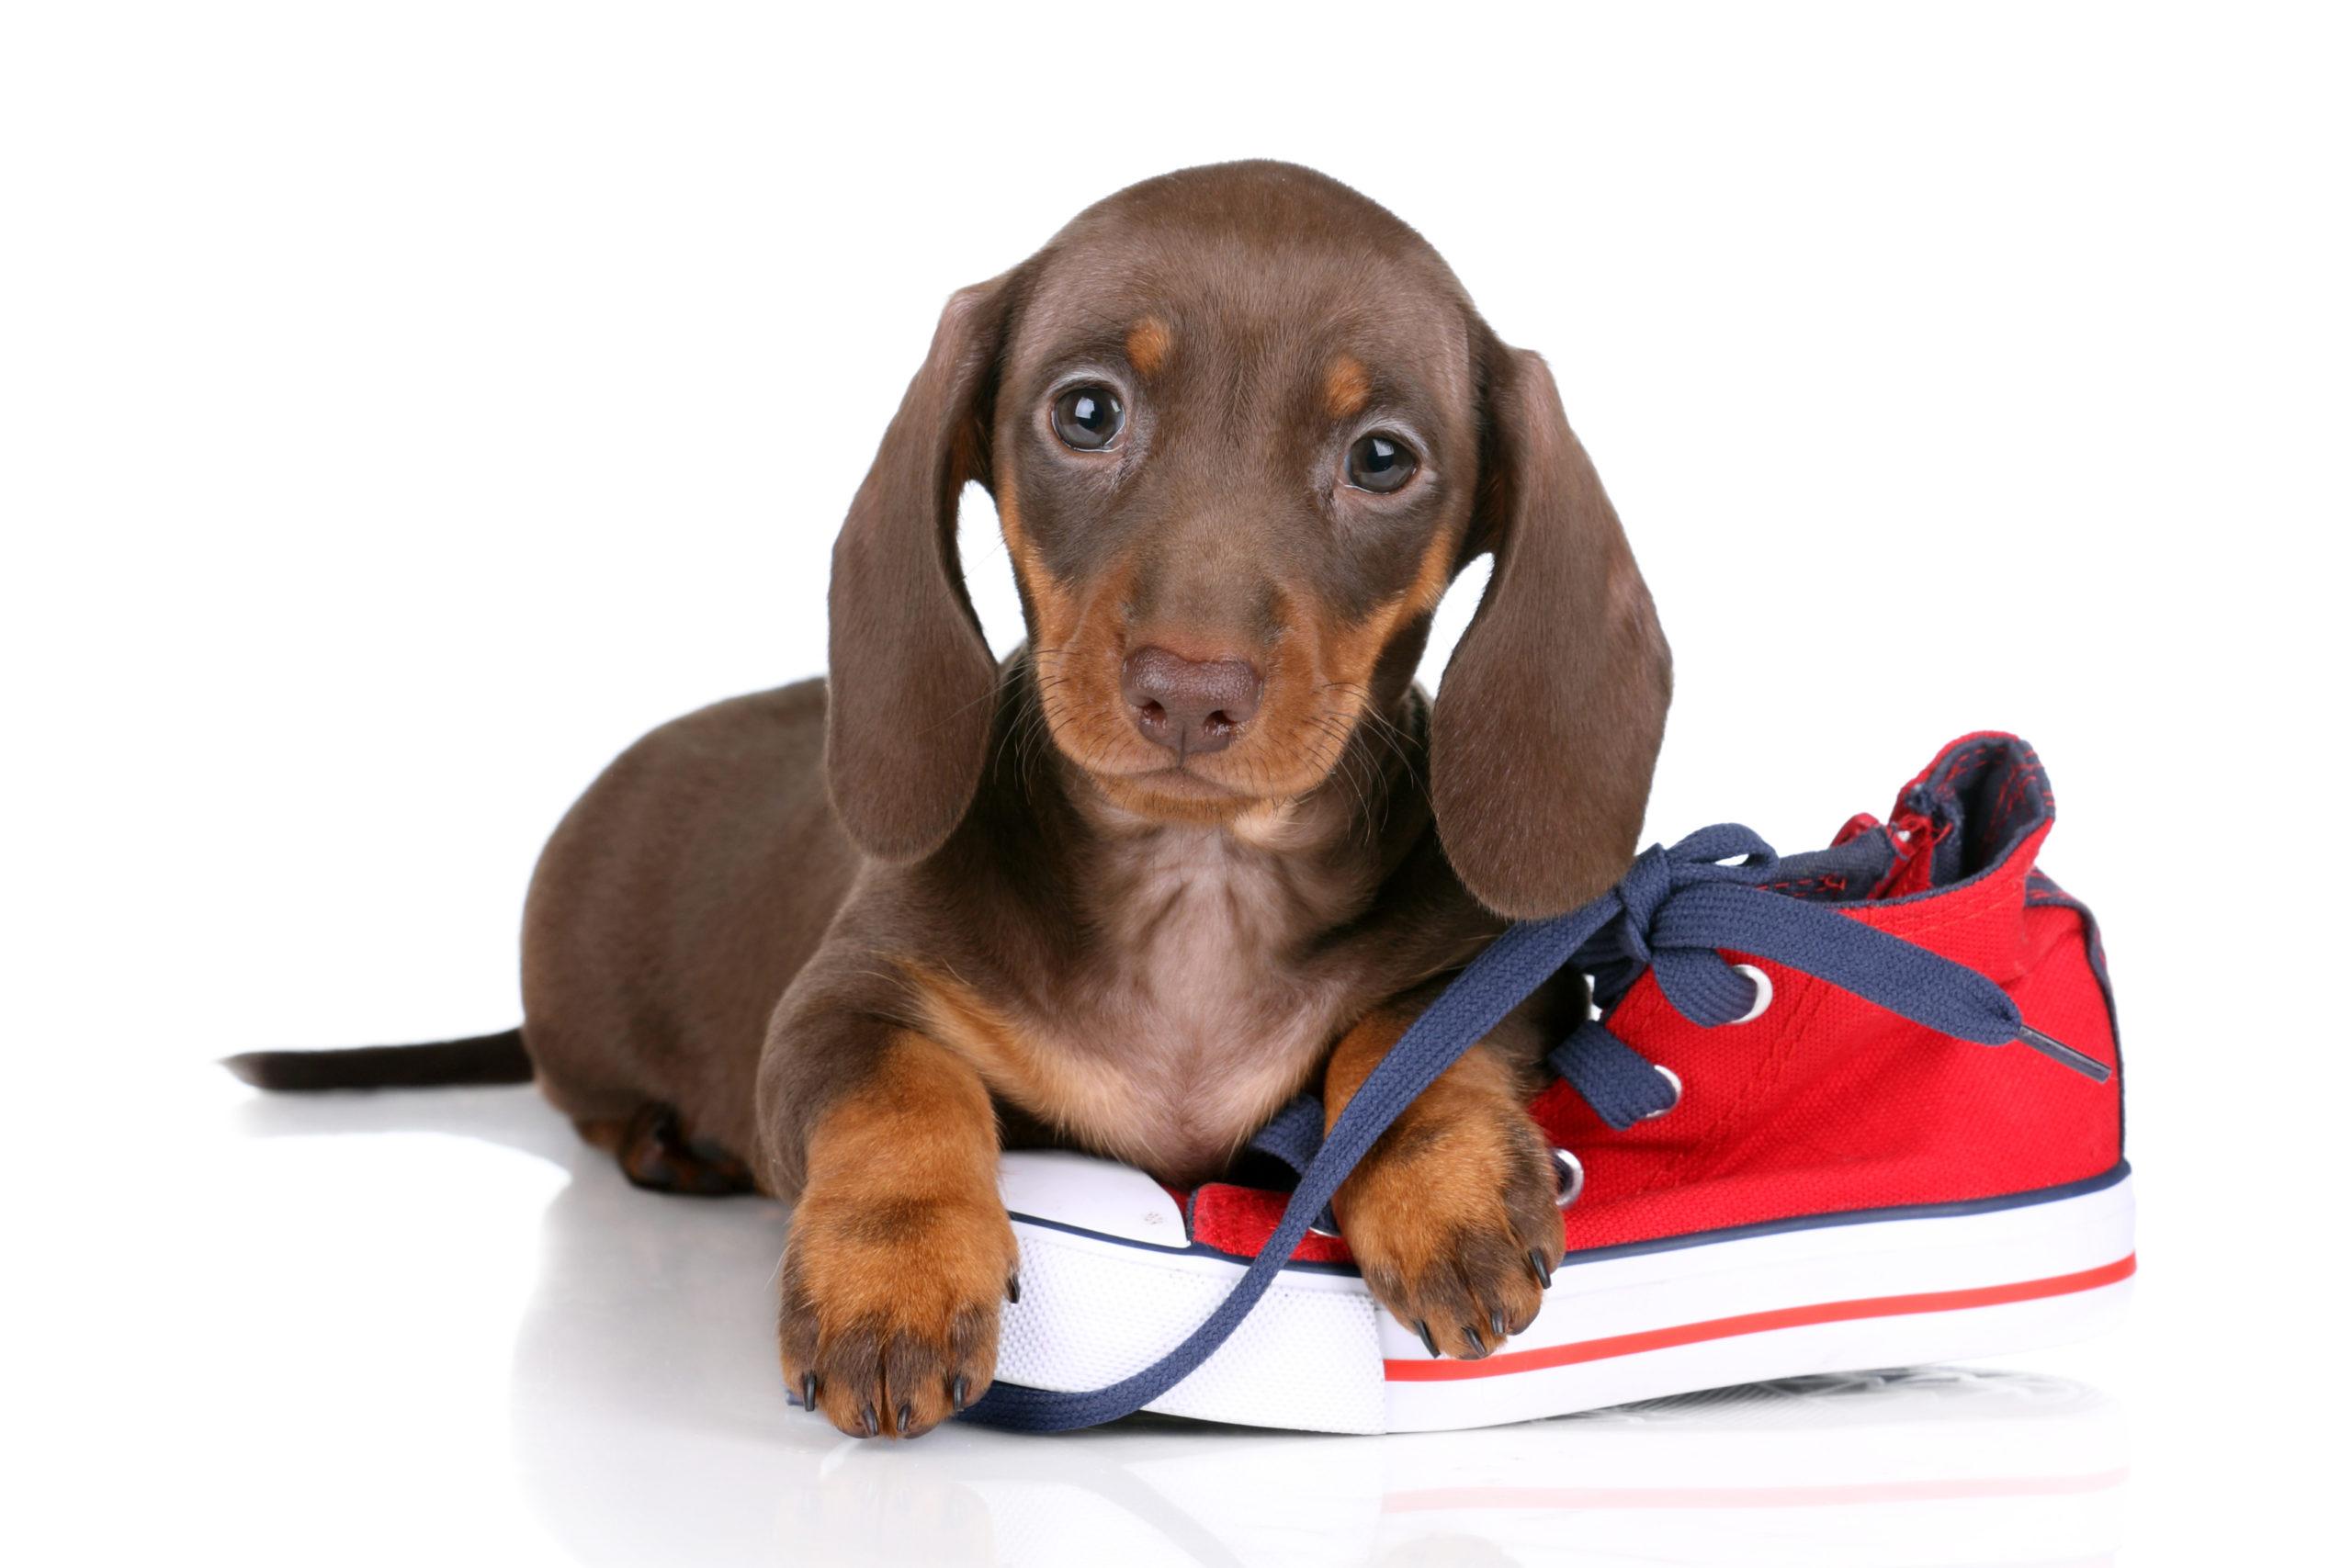 Cane con una scarpa